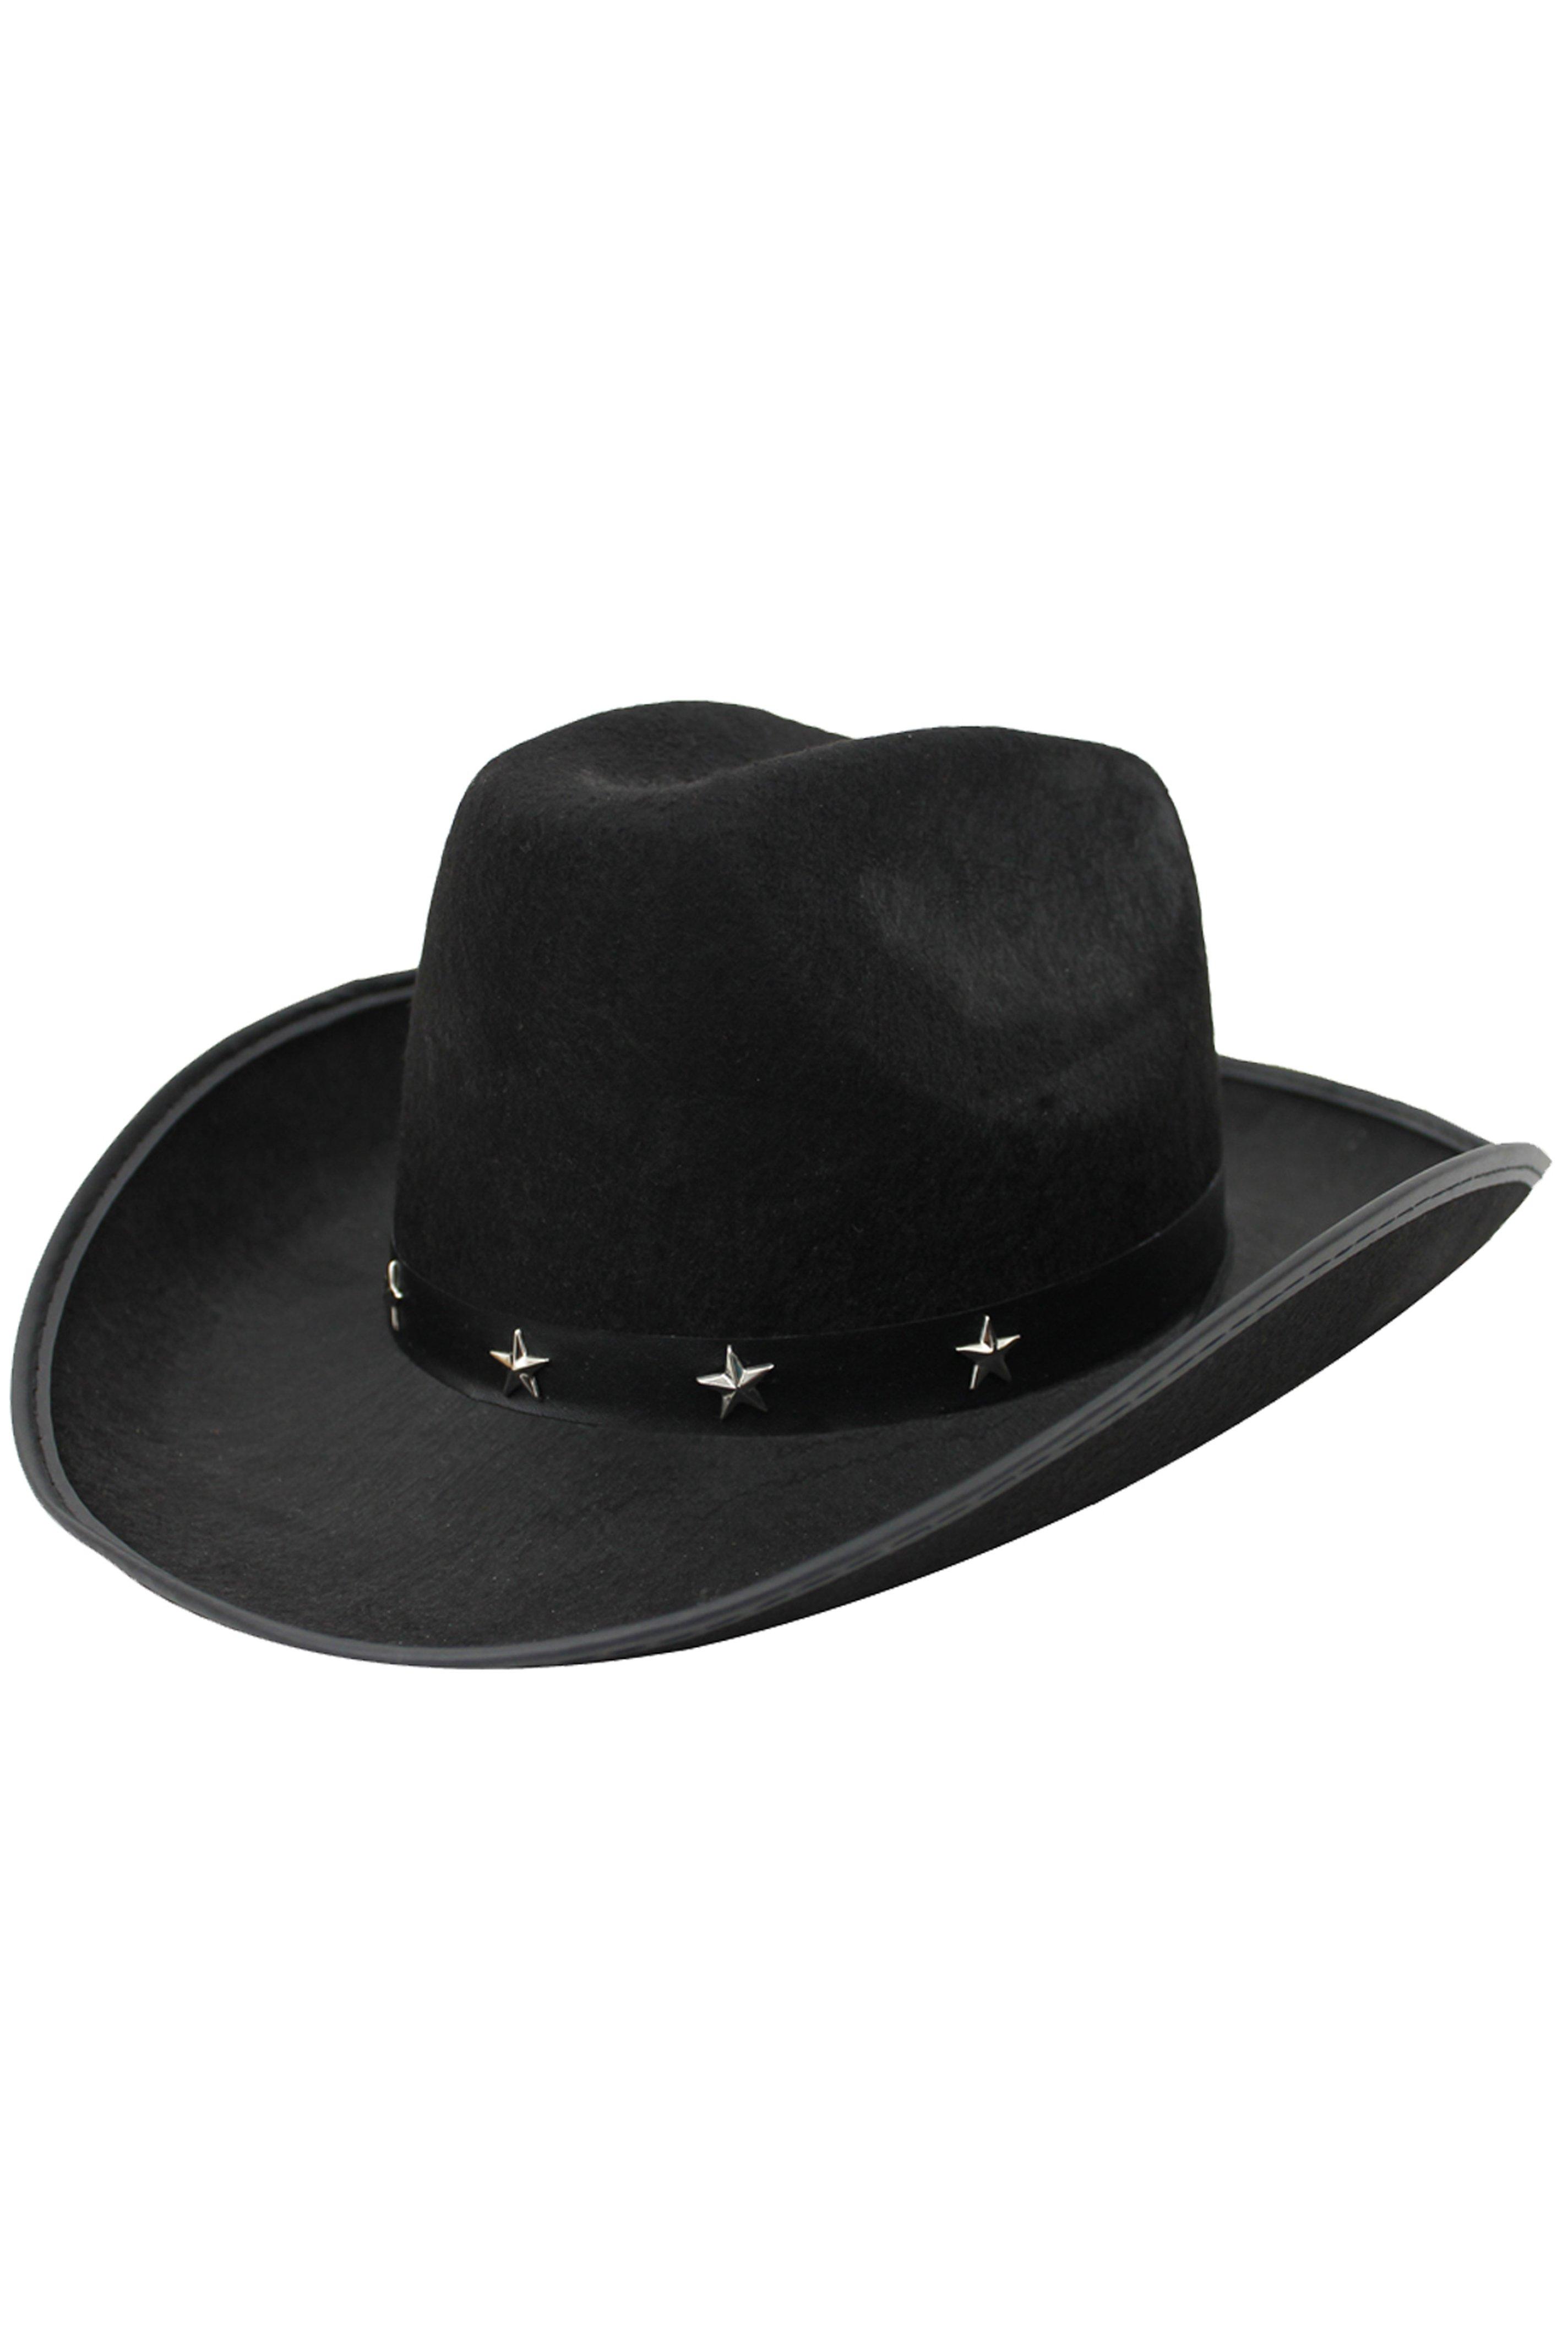 89e3212120b Black Star Studded Cowboy Hat - I Love Fancy Dress